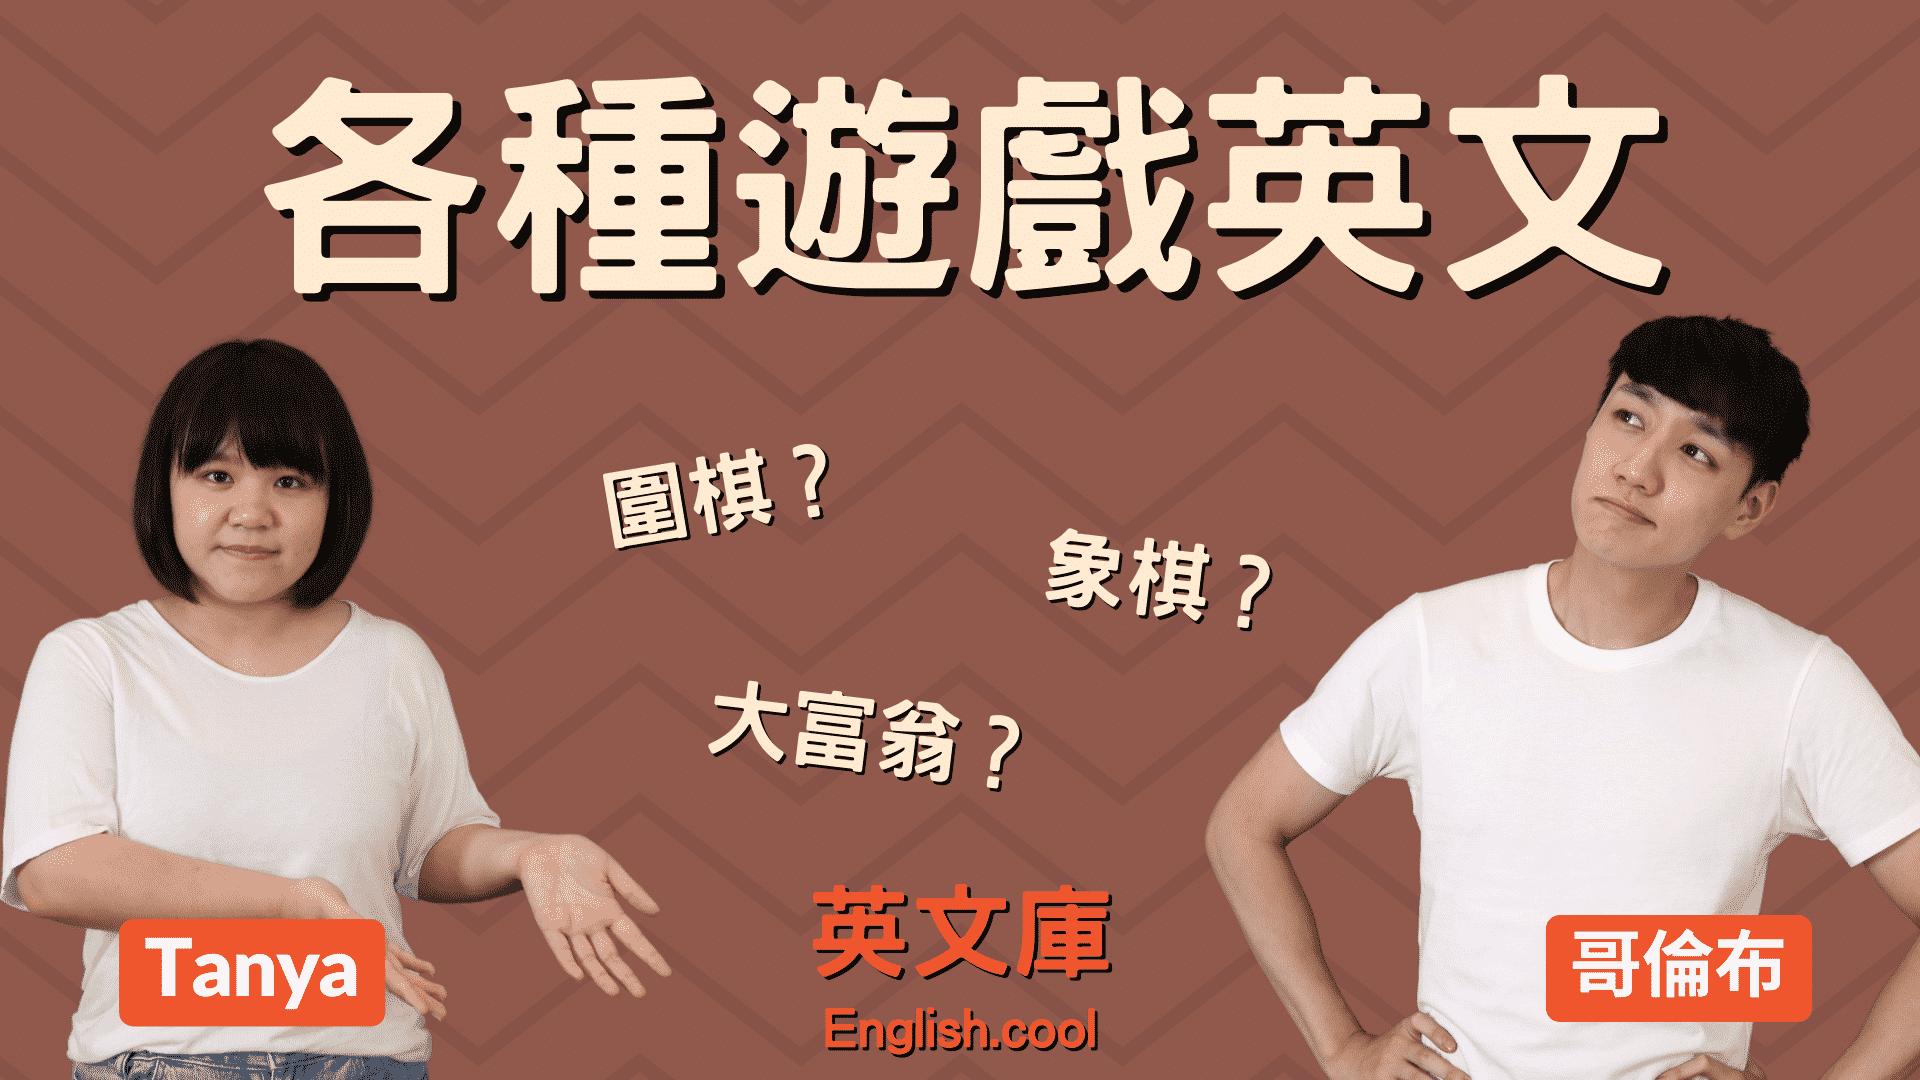 You are currently viewing 【各種遊戲英文】桌遊、圍棋、大富翁、撲克牌、象棋等英文!